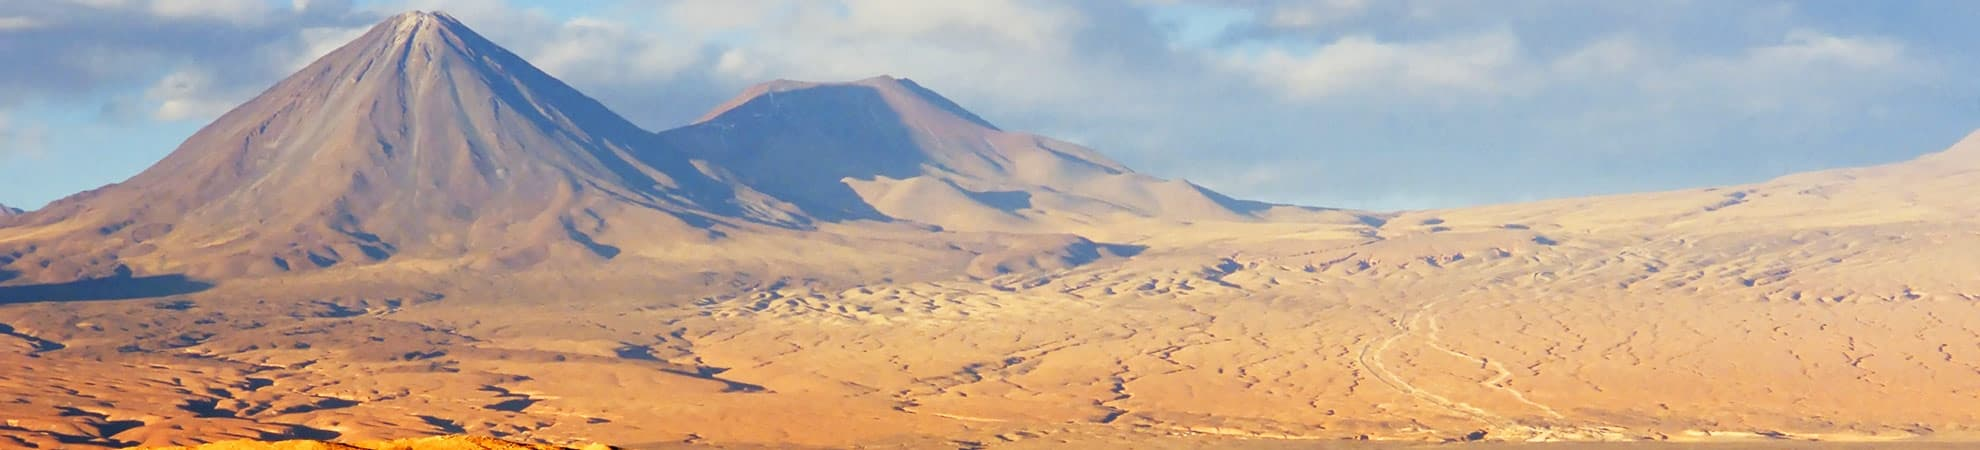 Voyage Norte Grande au Chili